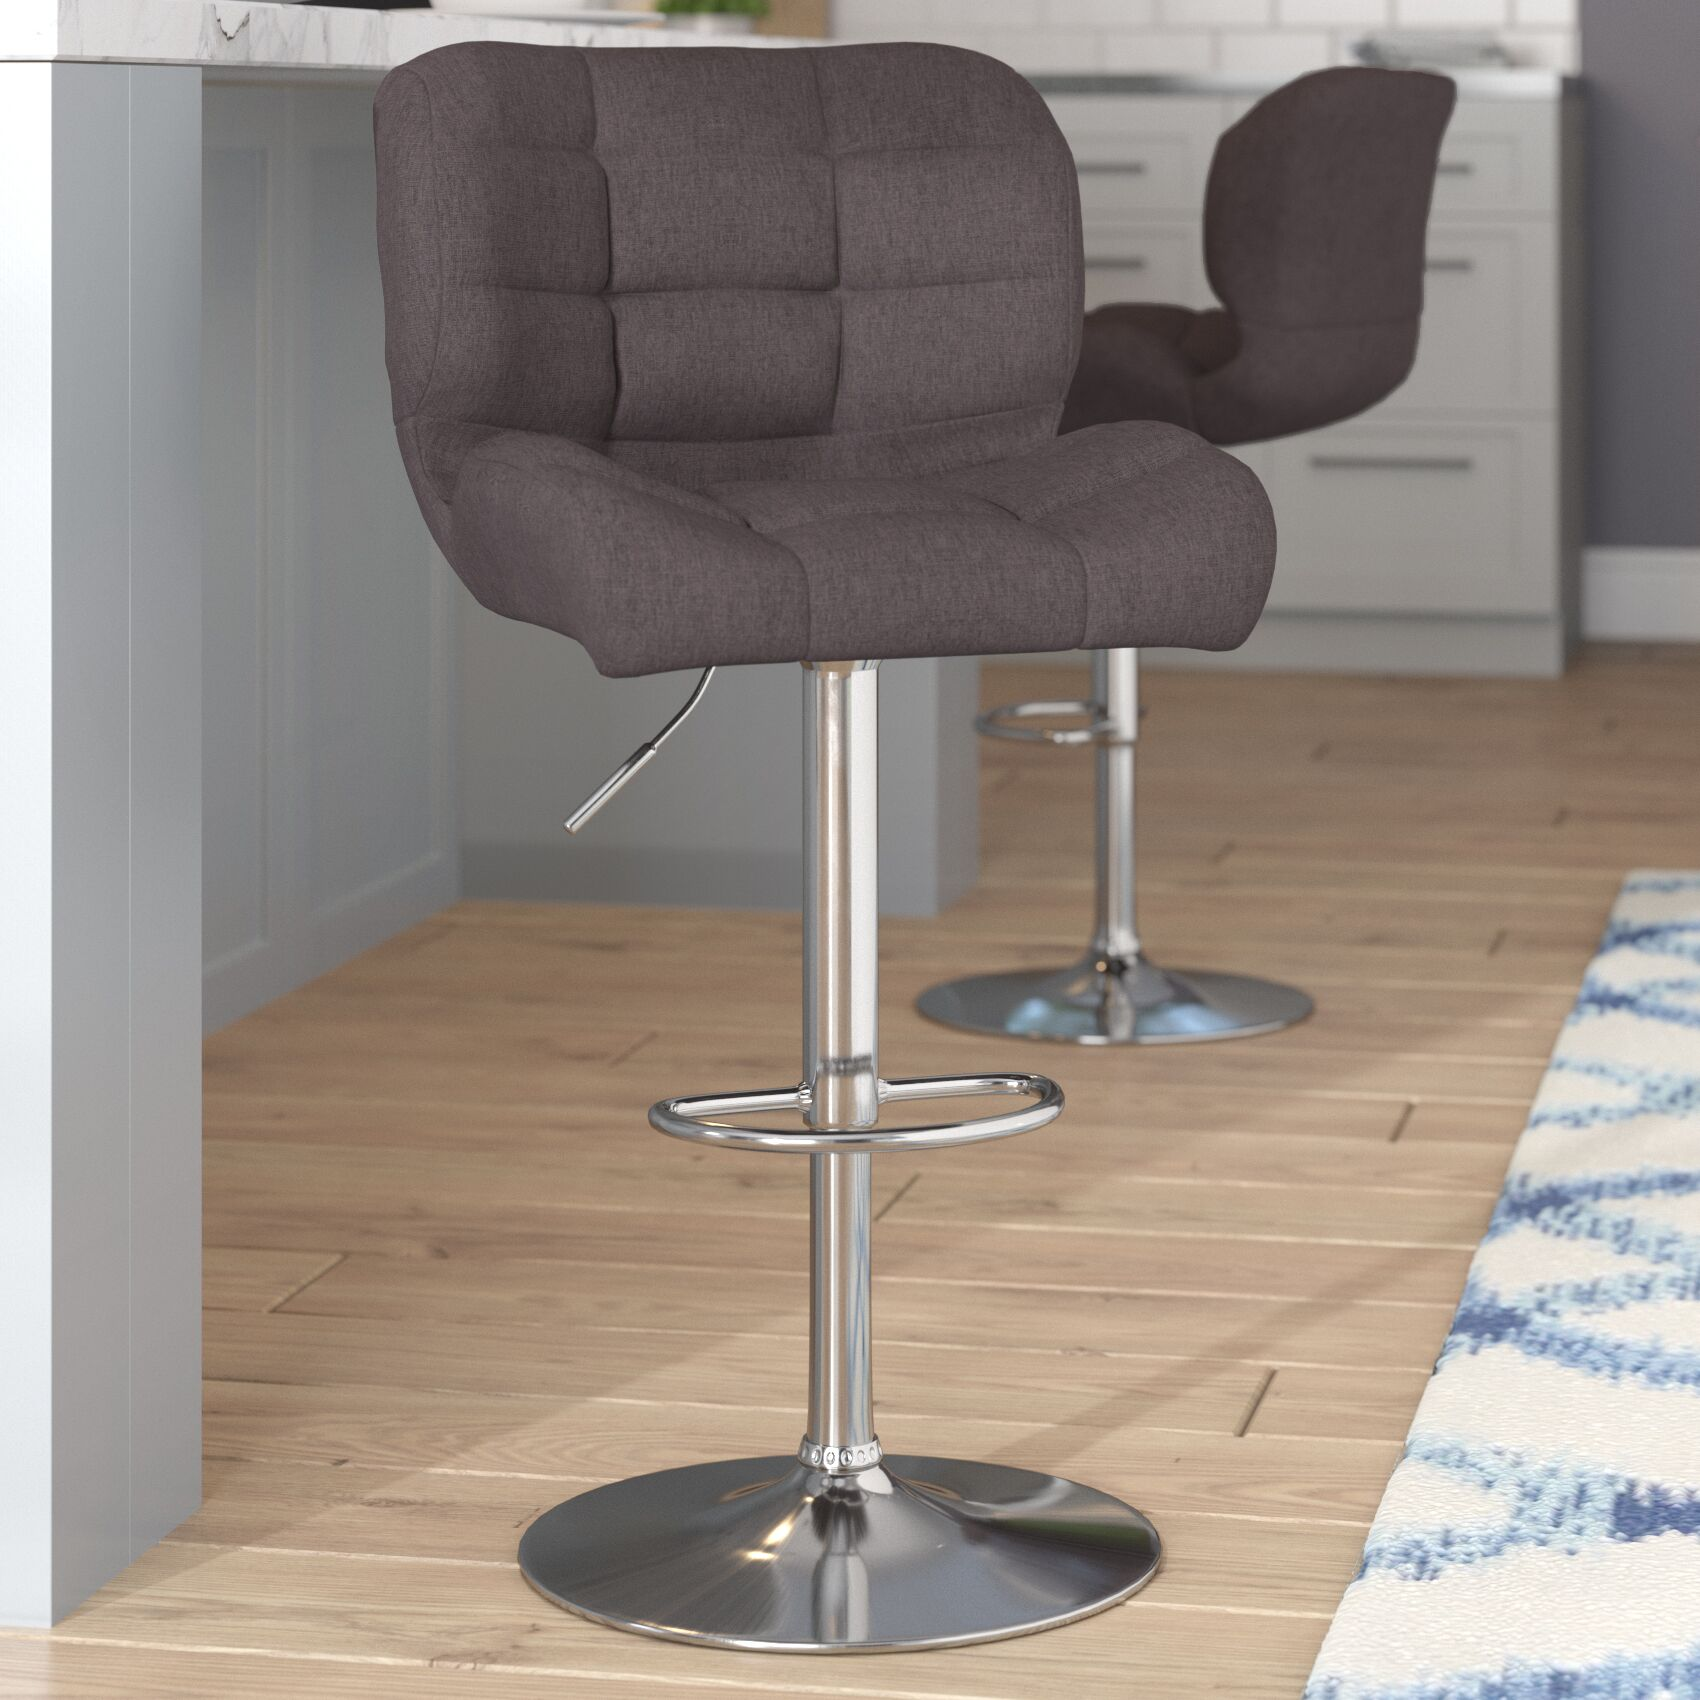 Hackbarth Adjustable Height Swivel Bar Stool Upholstery: Dark Gray